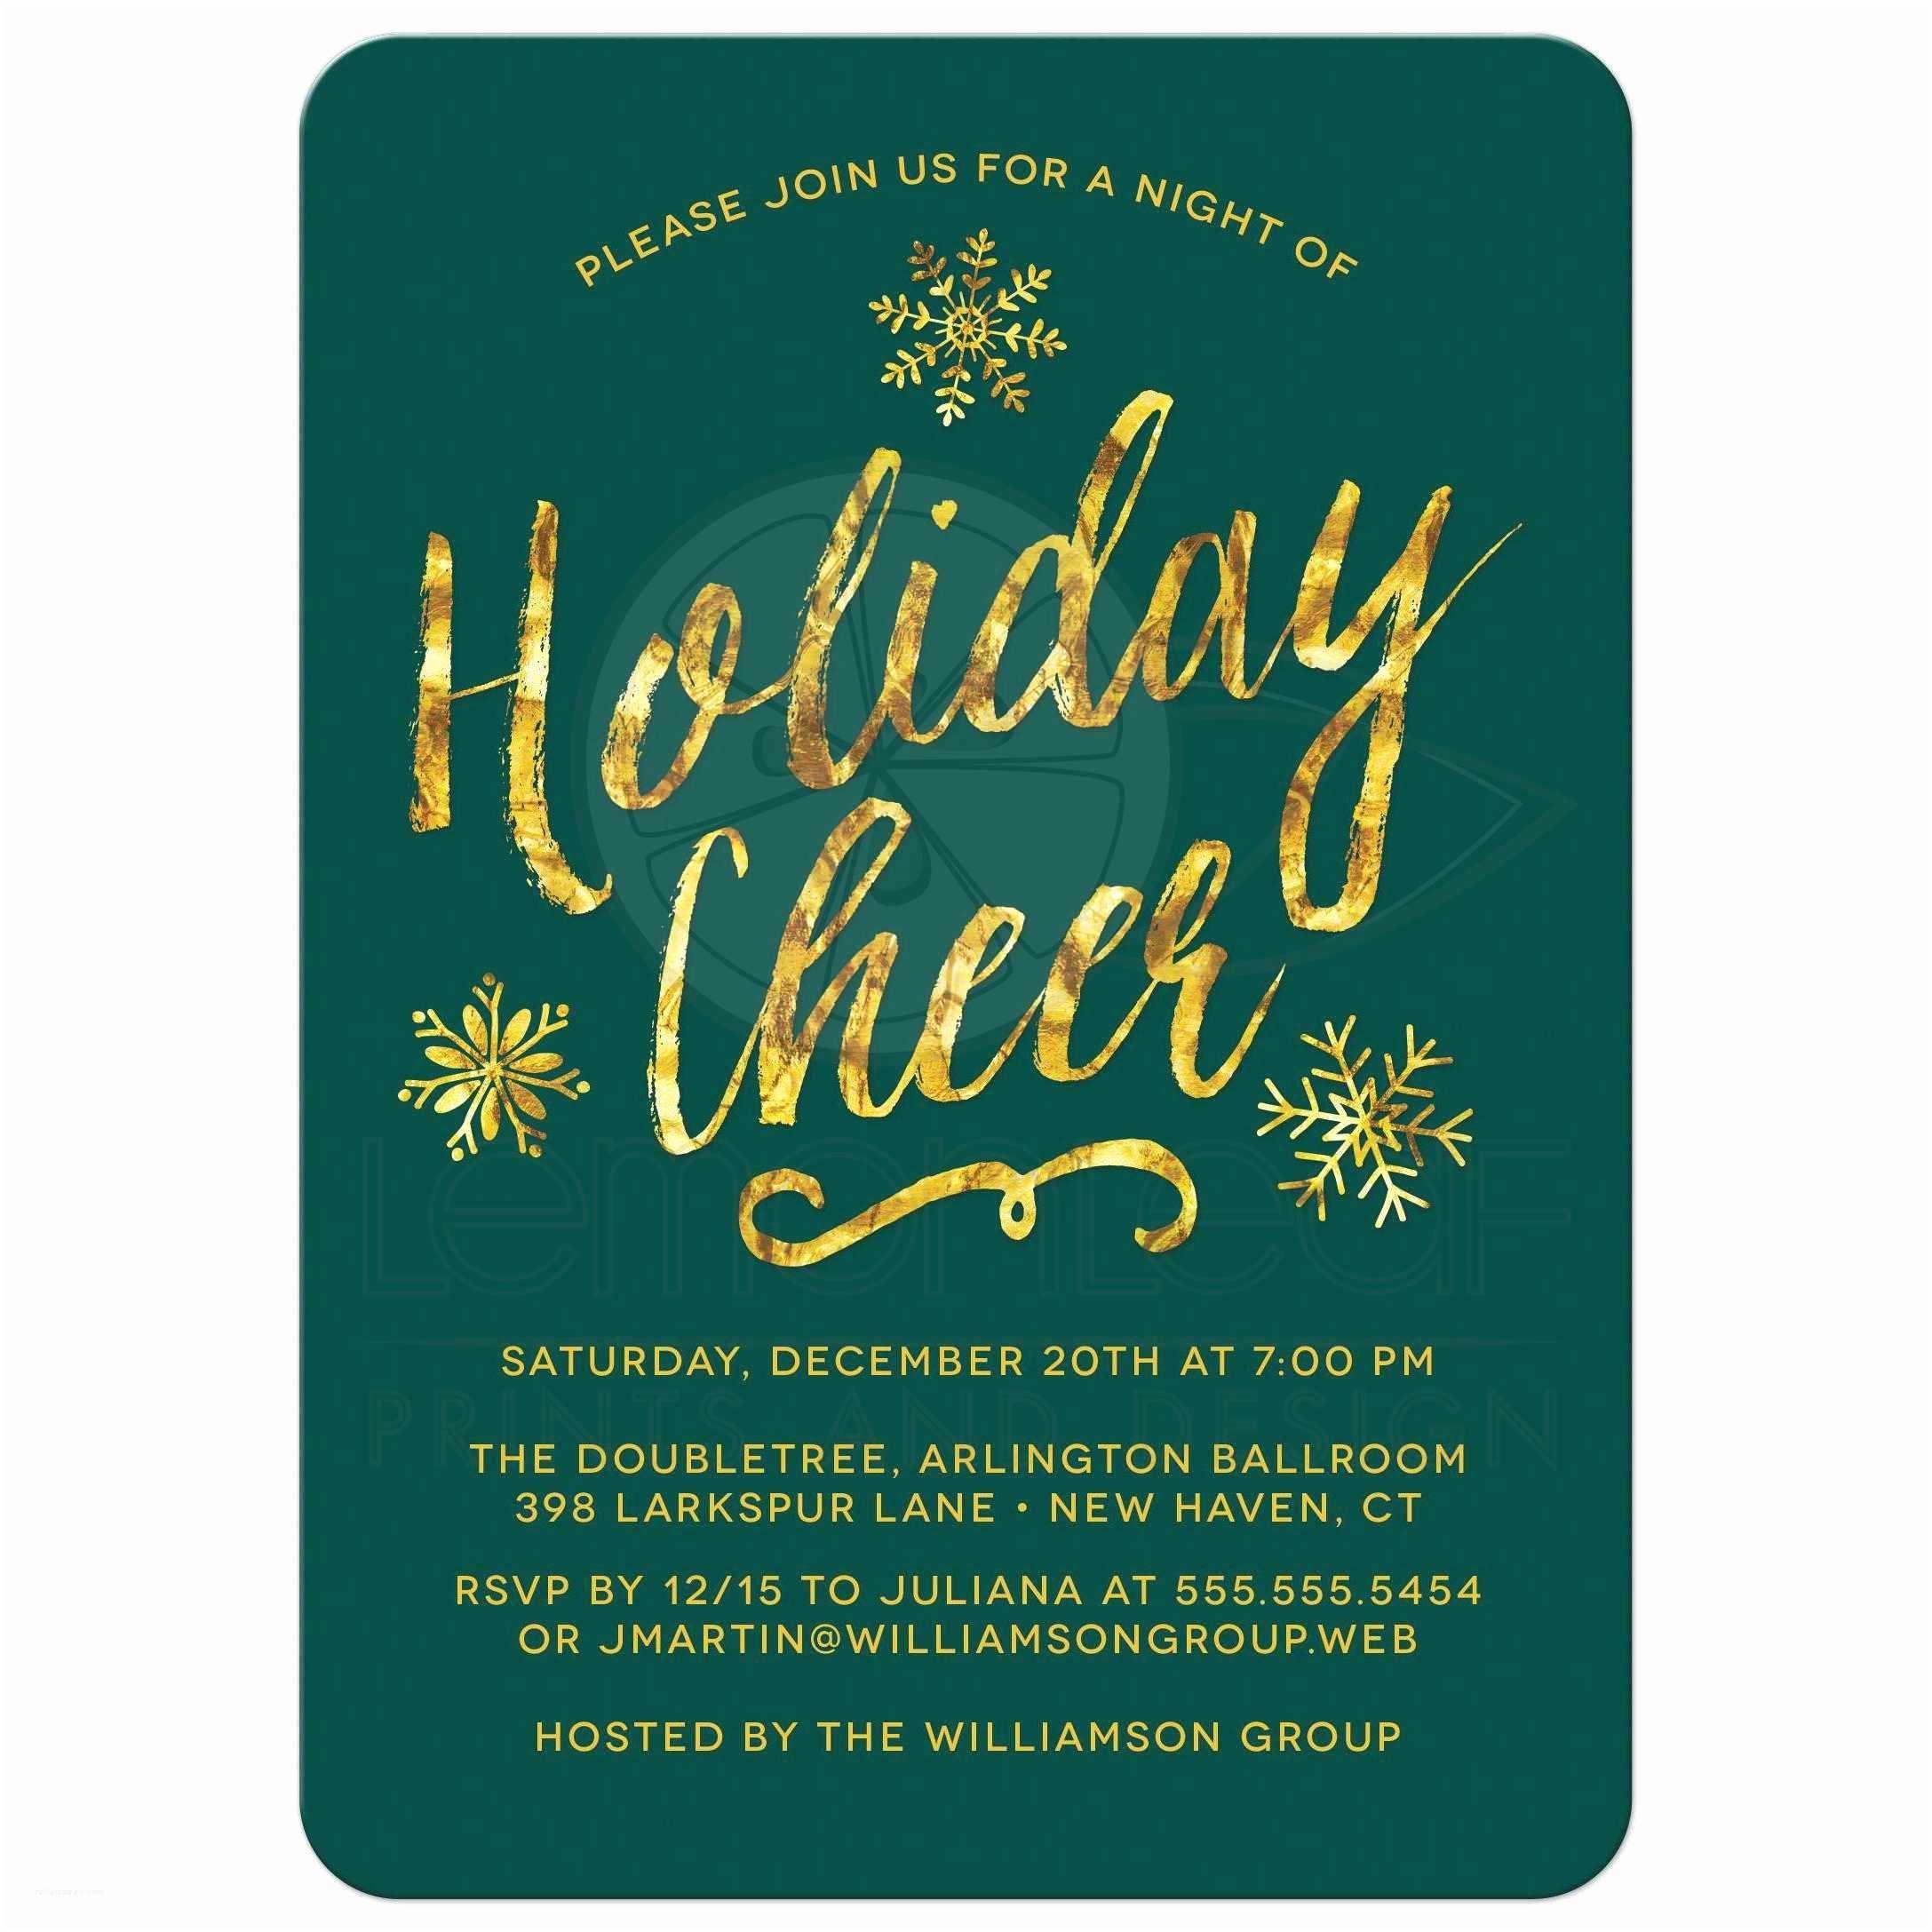 Company Christmas Party Invitations Corporate Holiday Party Invitations Golden Holiday Cheer